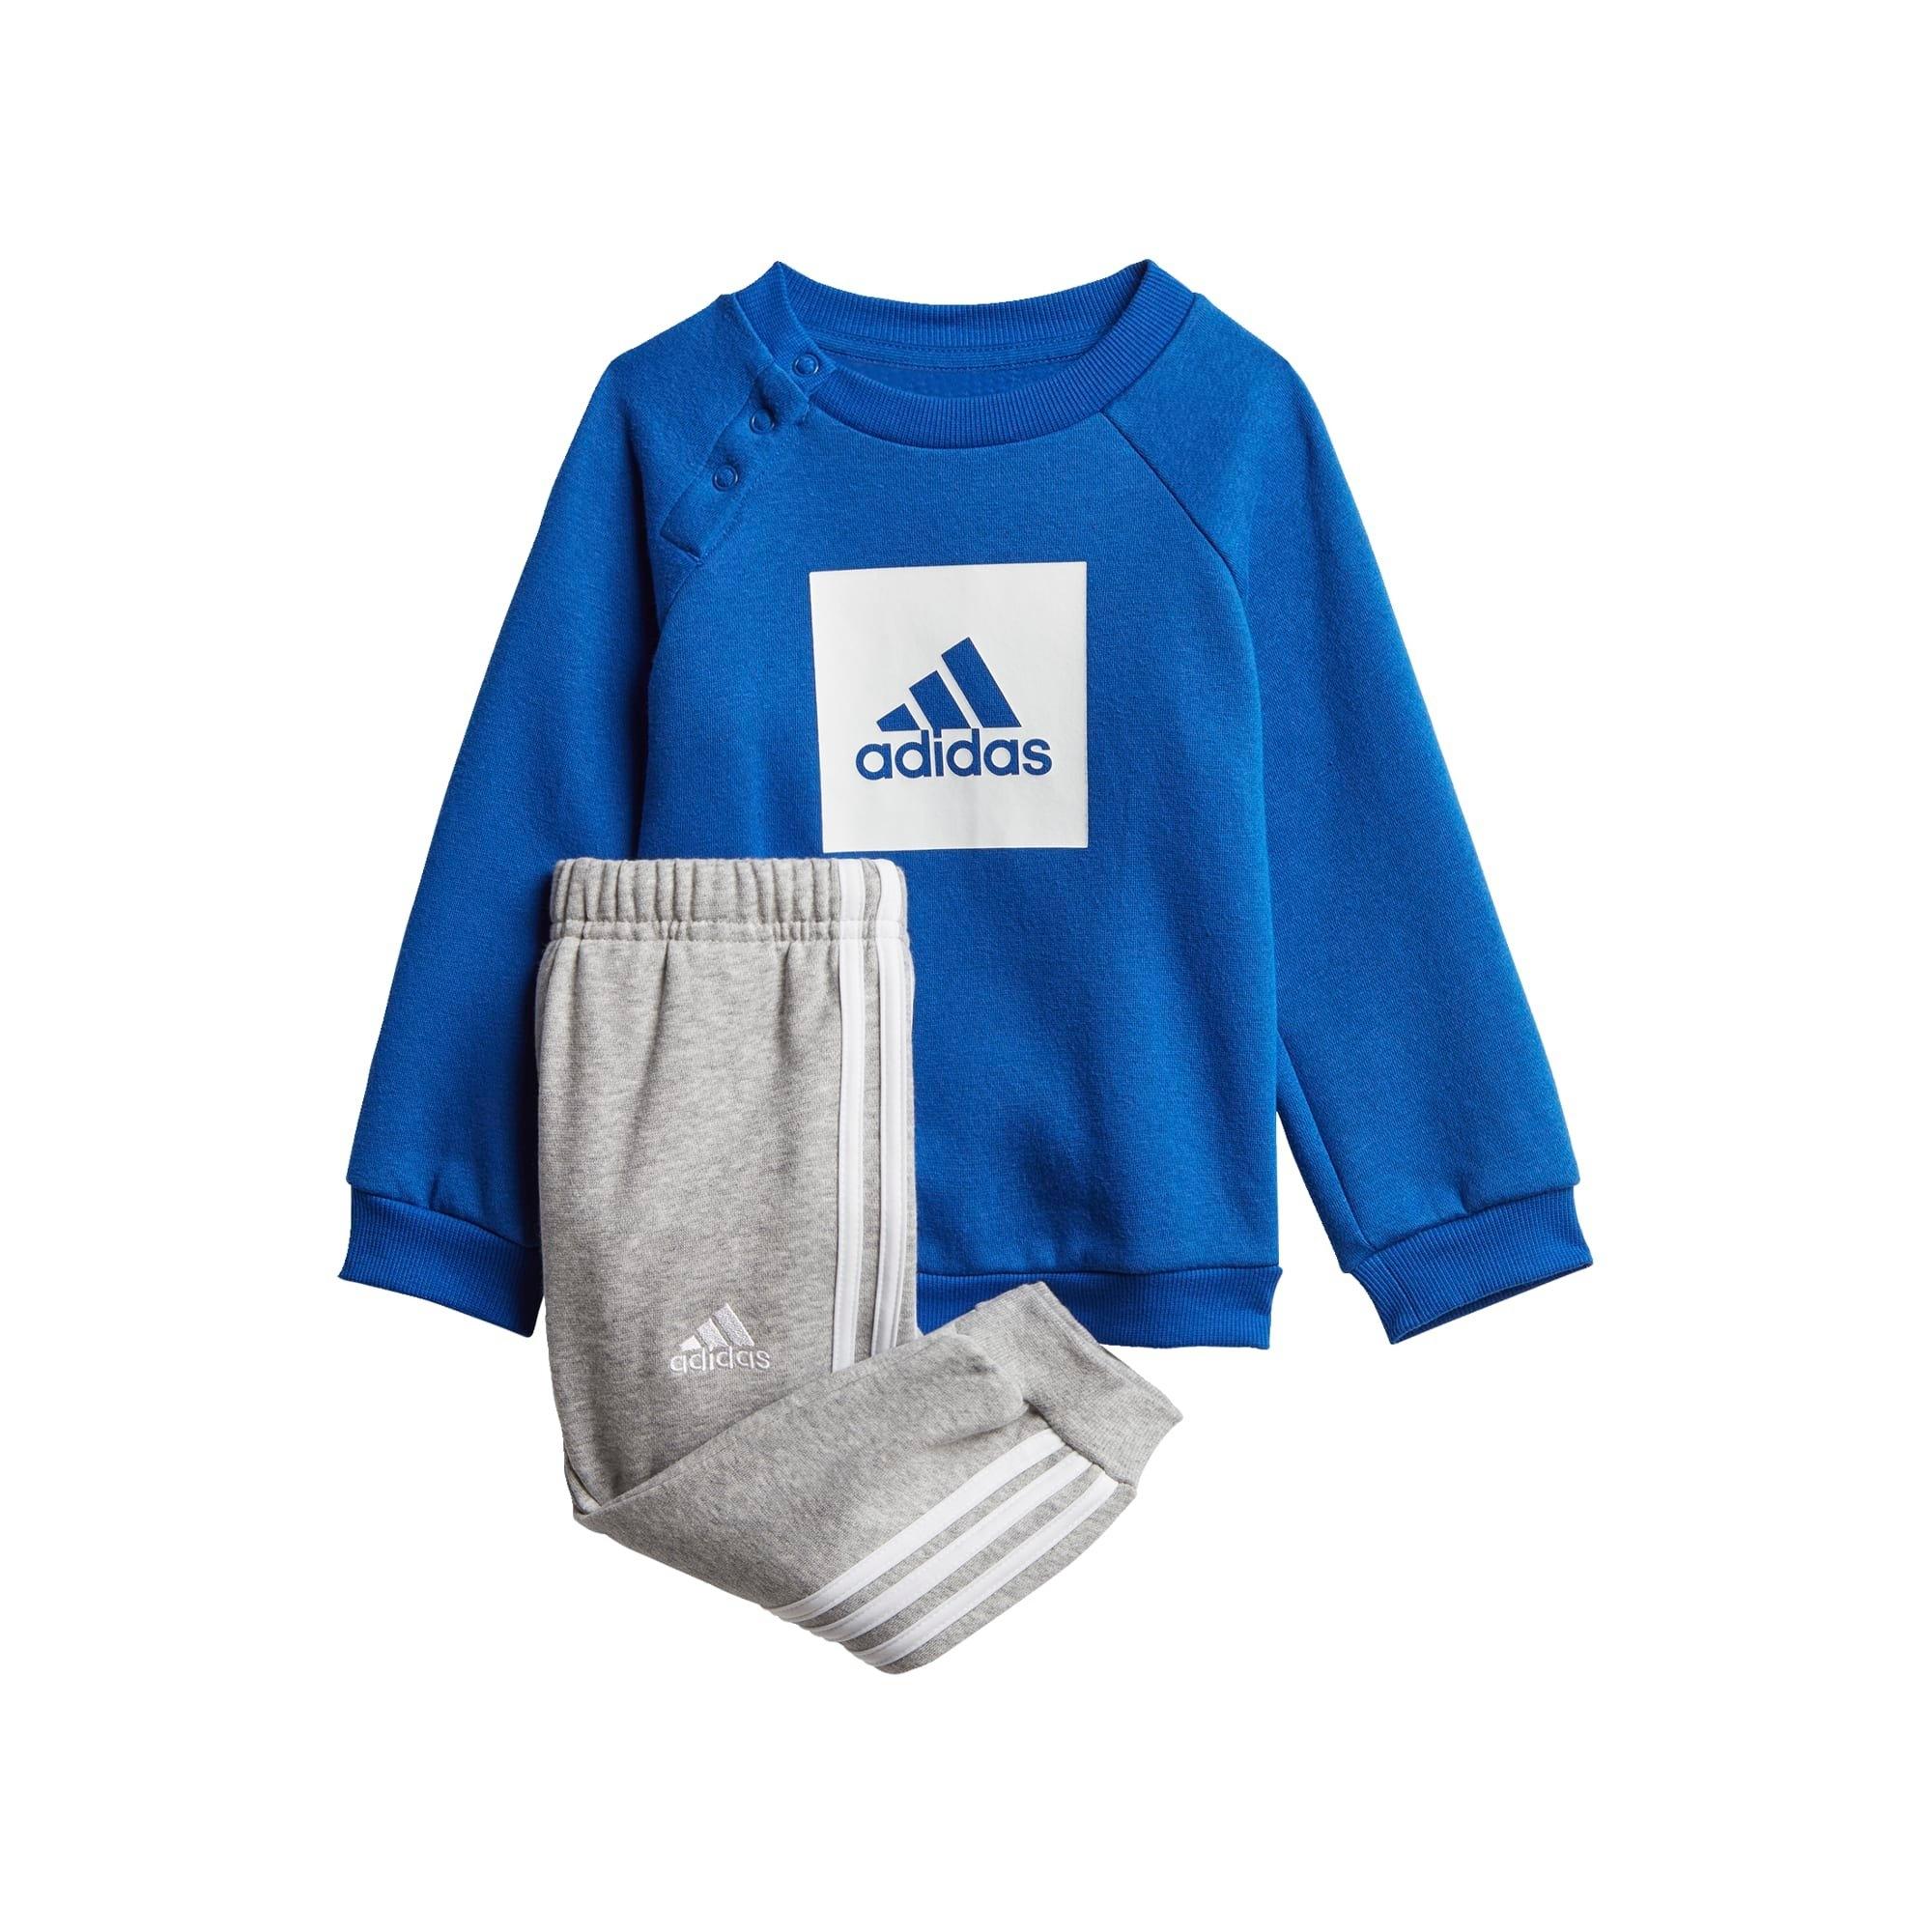 adidas Performance joggingpak 3-STRIPES FLEECE (set, 2-delig) bij OTTO online kopen